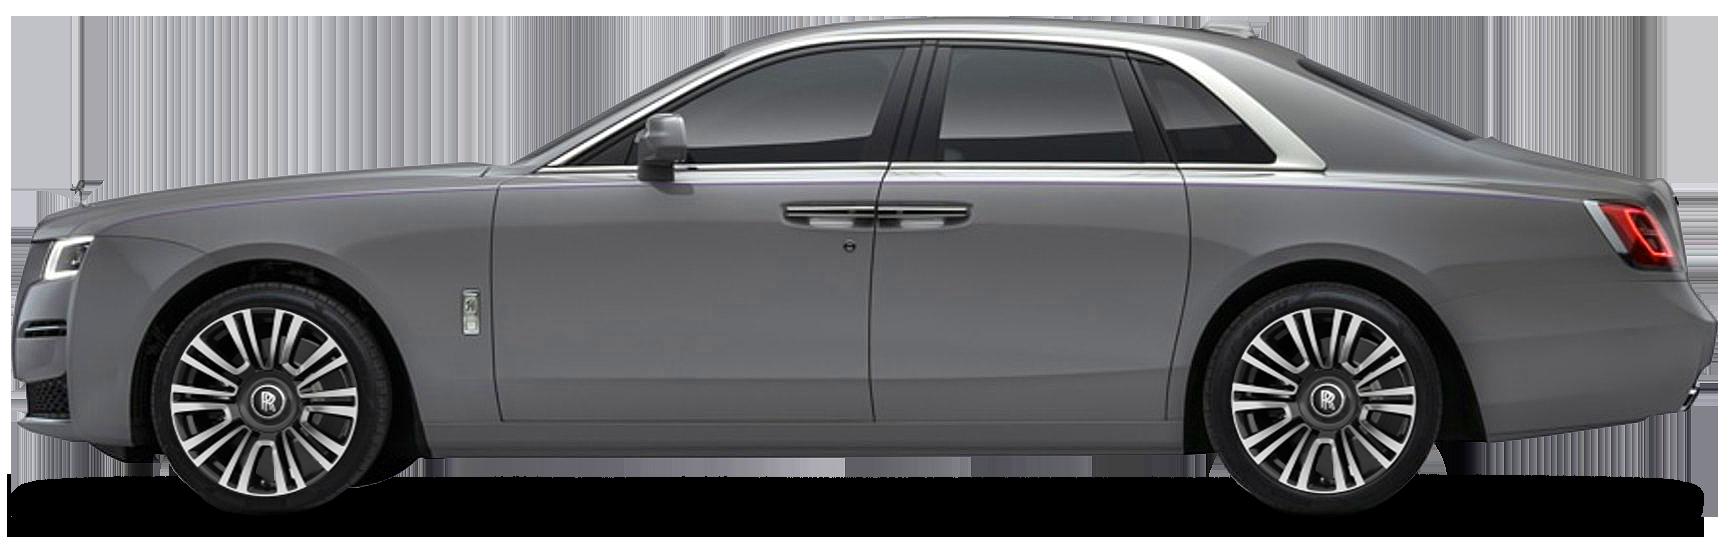 2021 Rolls-Royce Ghost Sedan